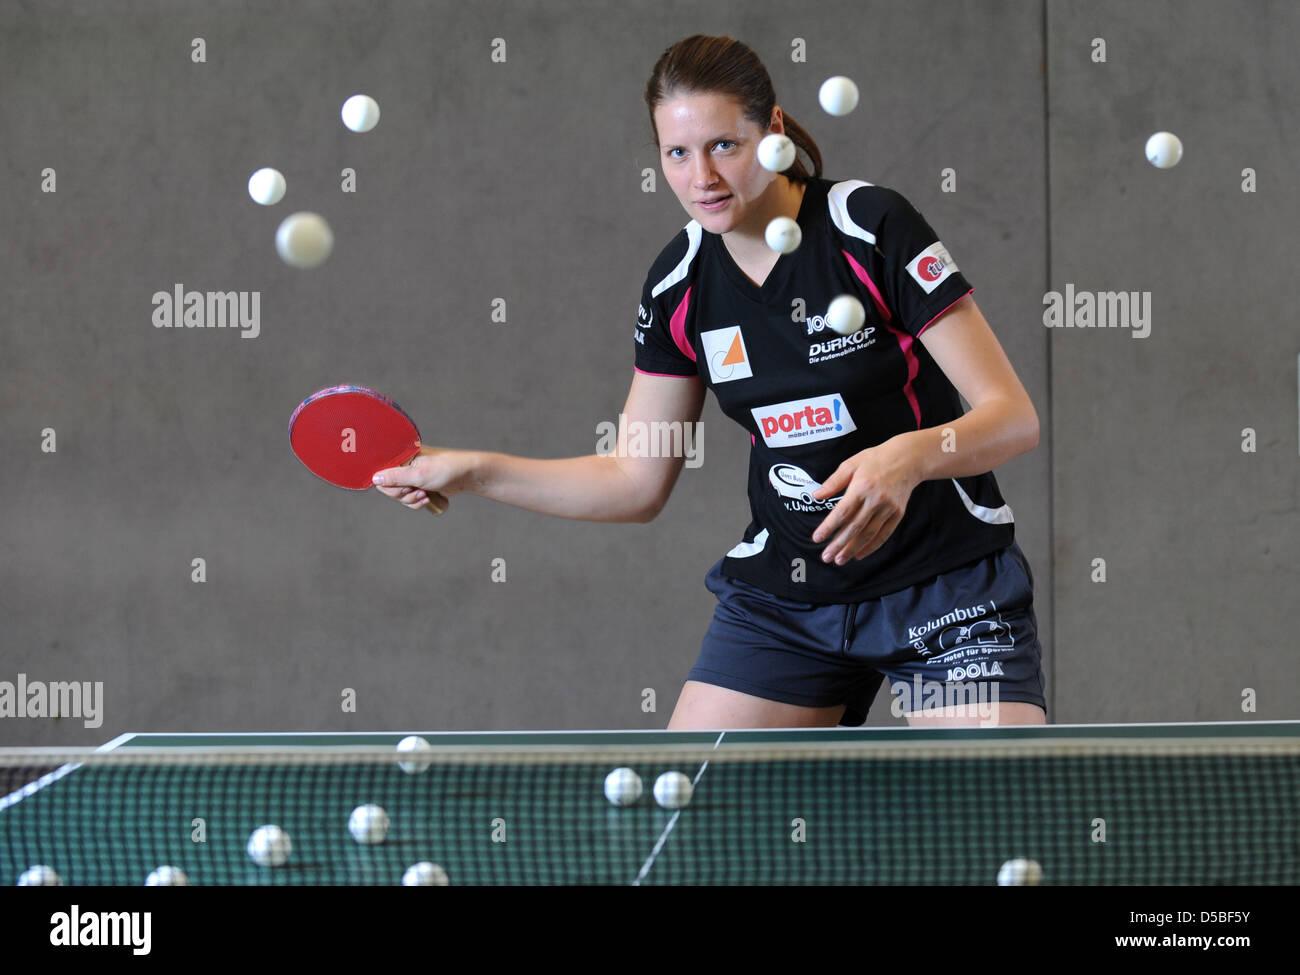 Berlín, Alemania, el jugador de tenis de mesa Irene Ivancan Imagen De Stock